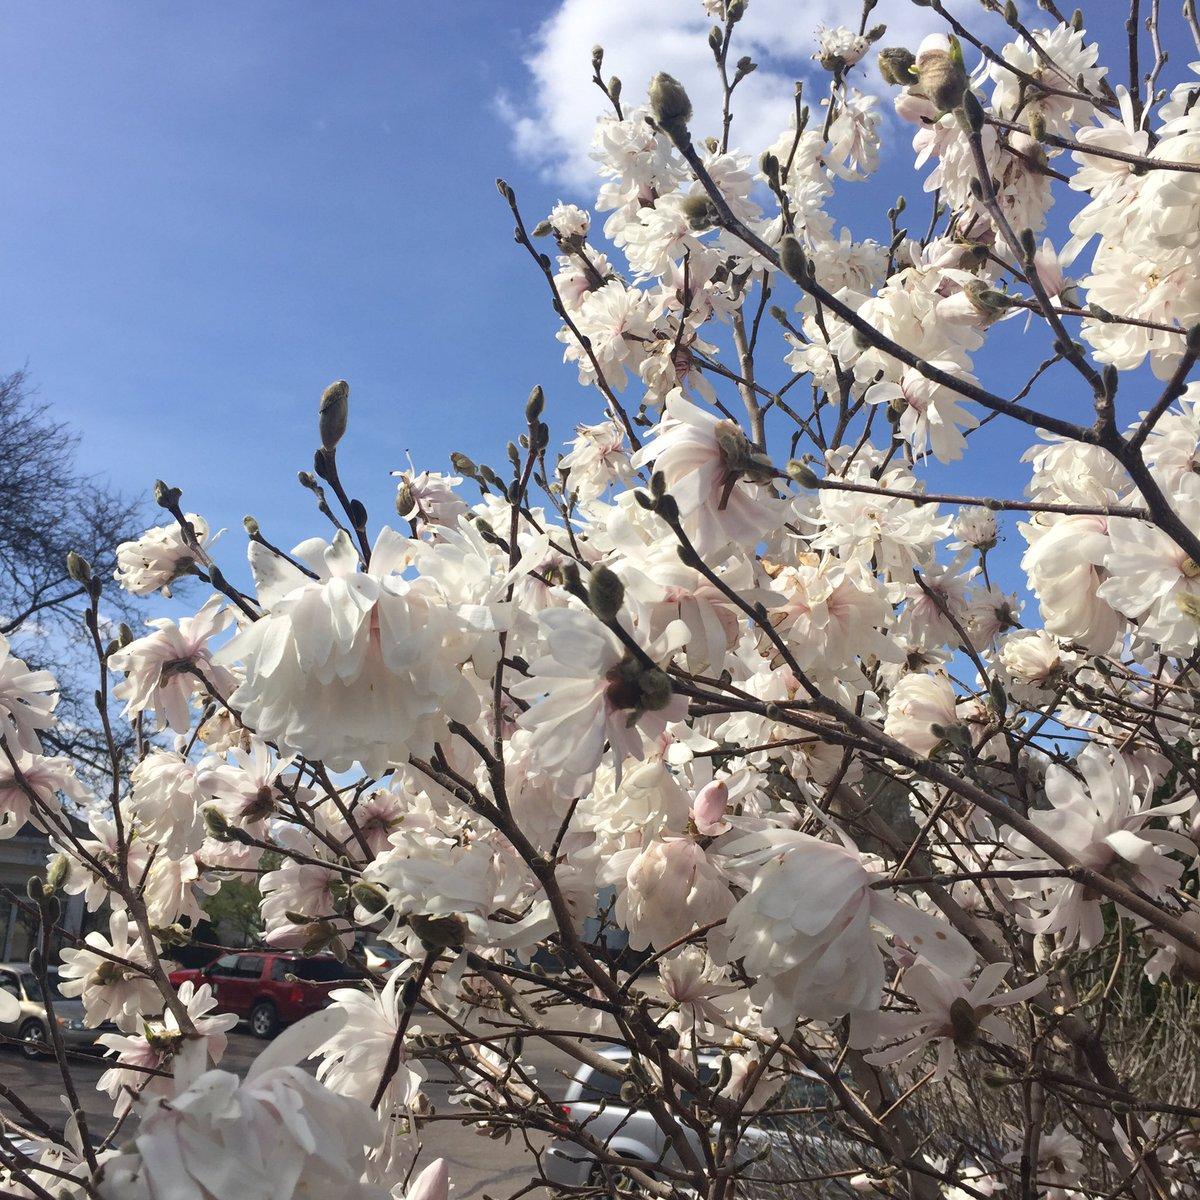 Ryan Mcenaney On Twitter Springtime With Centennial Blush Magnolia